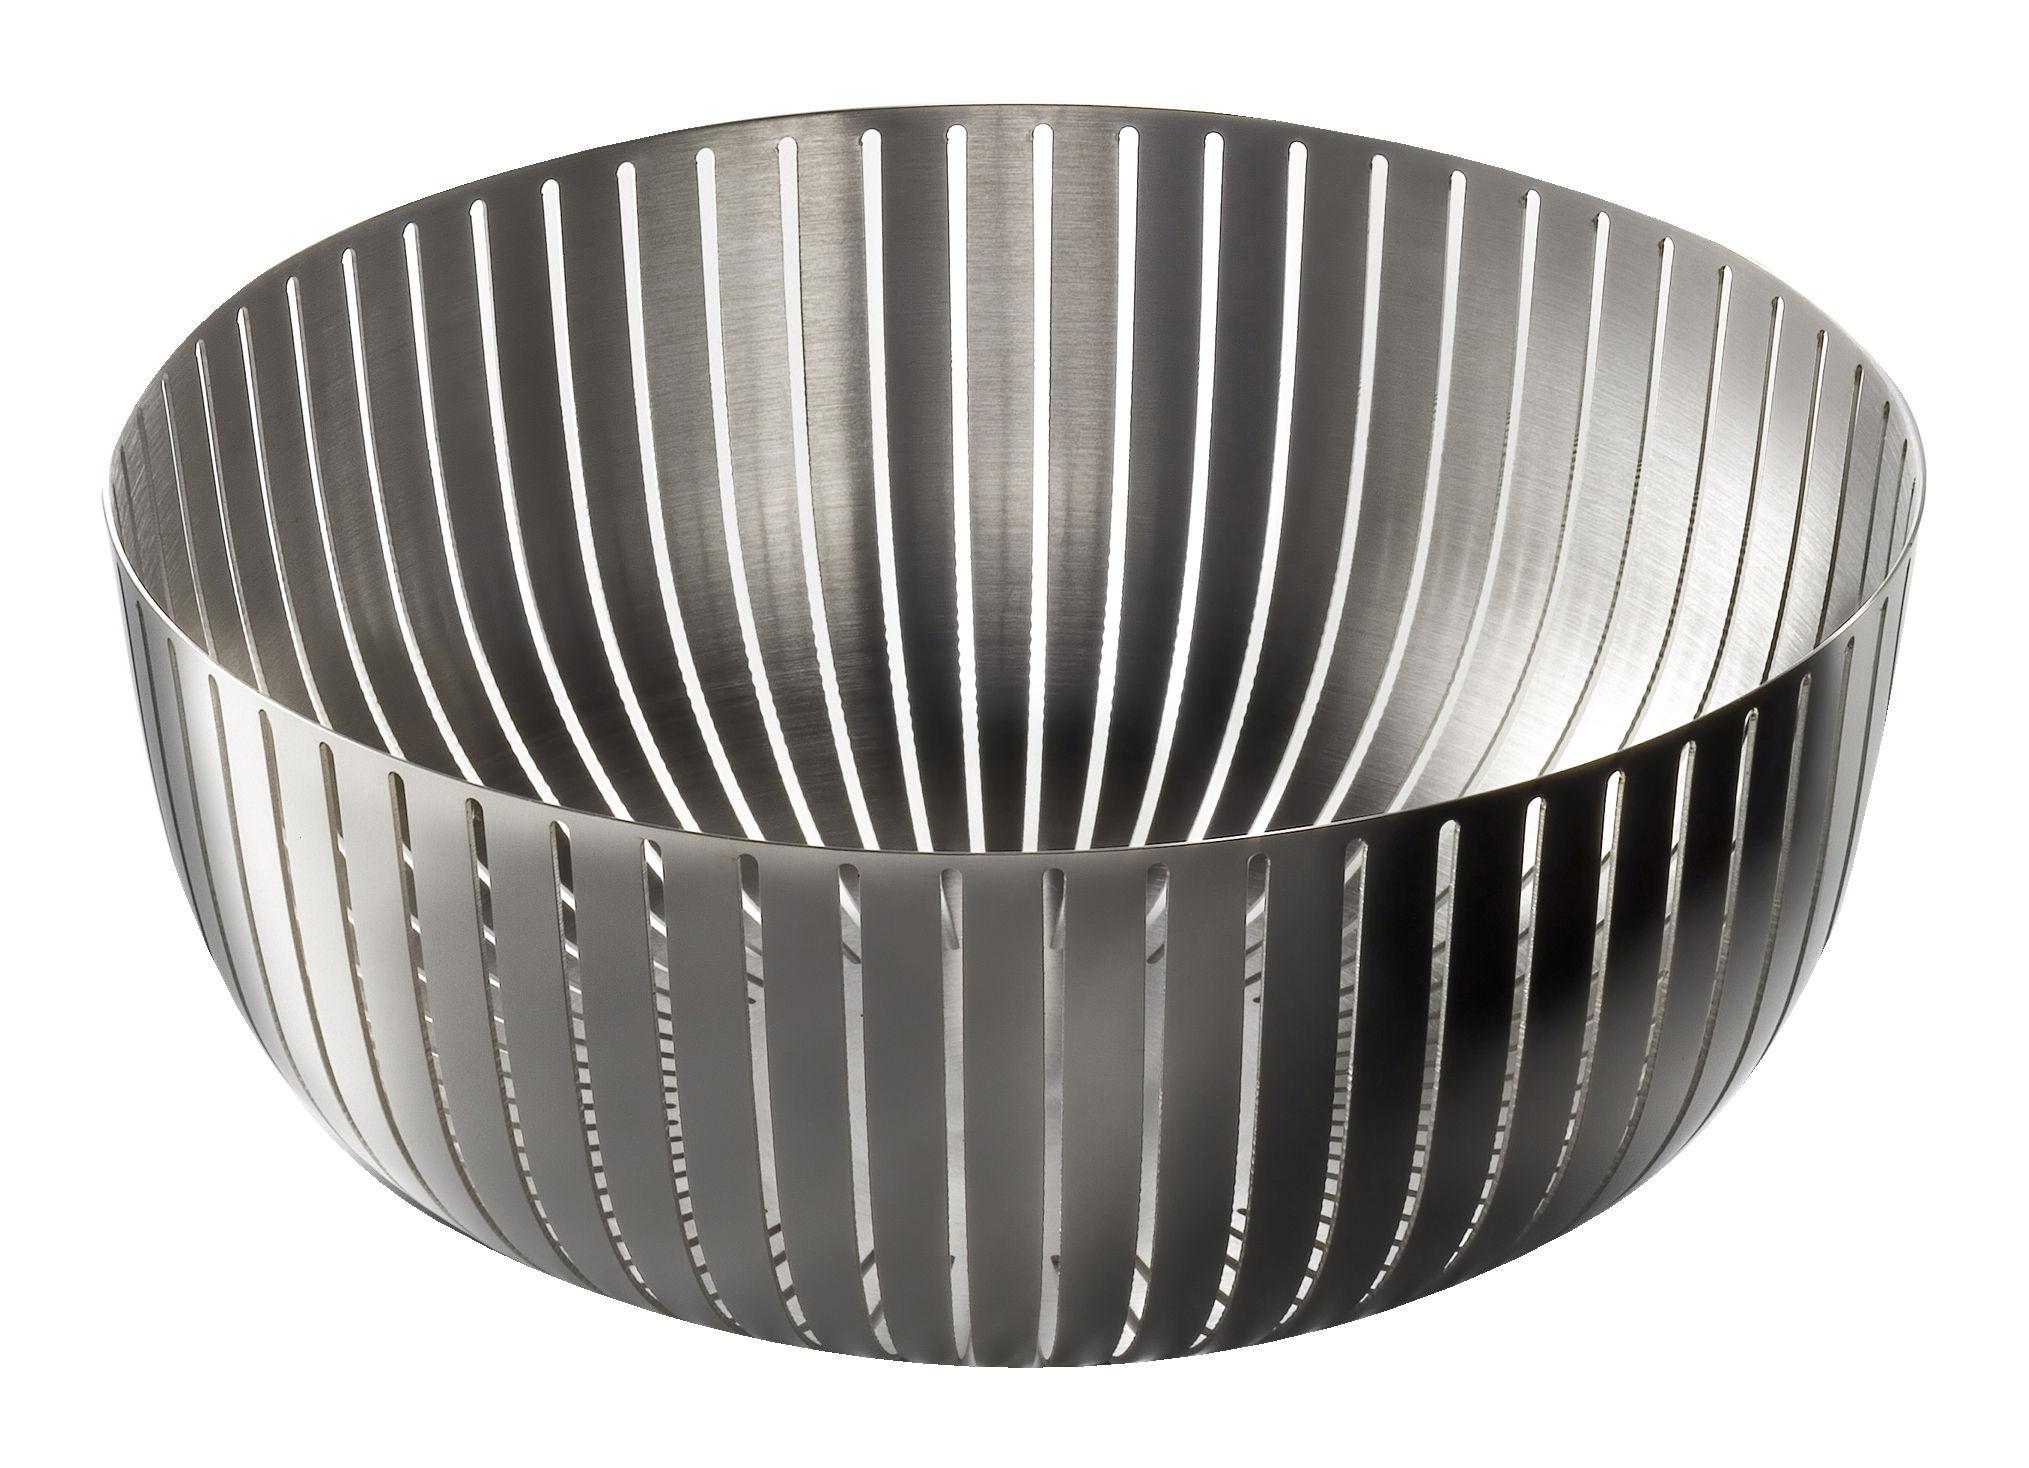 Tableware - Fruit Bowls & Centrepieces - Va bene cosi Basket - Ø 20 cm by Serafino Zani - Polished stainless steel - Stainless steel